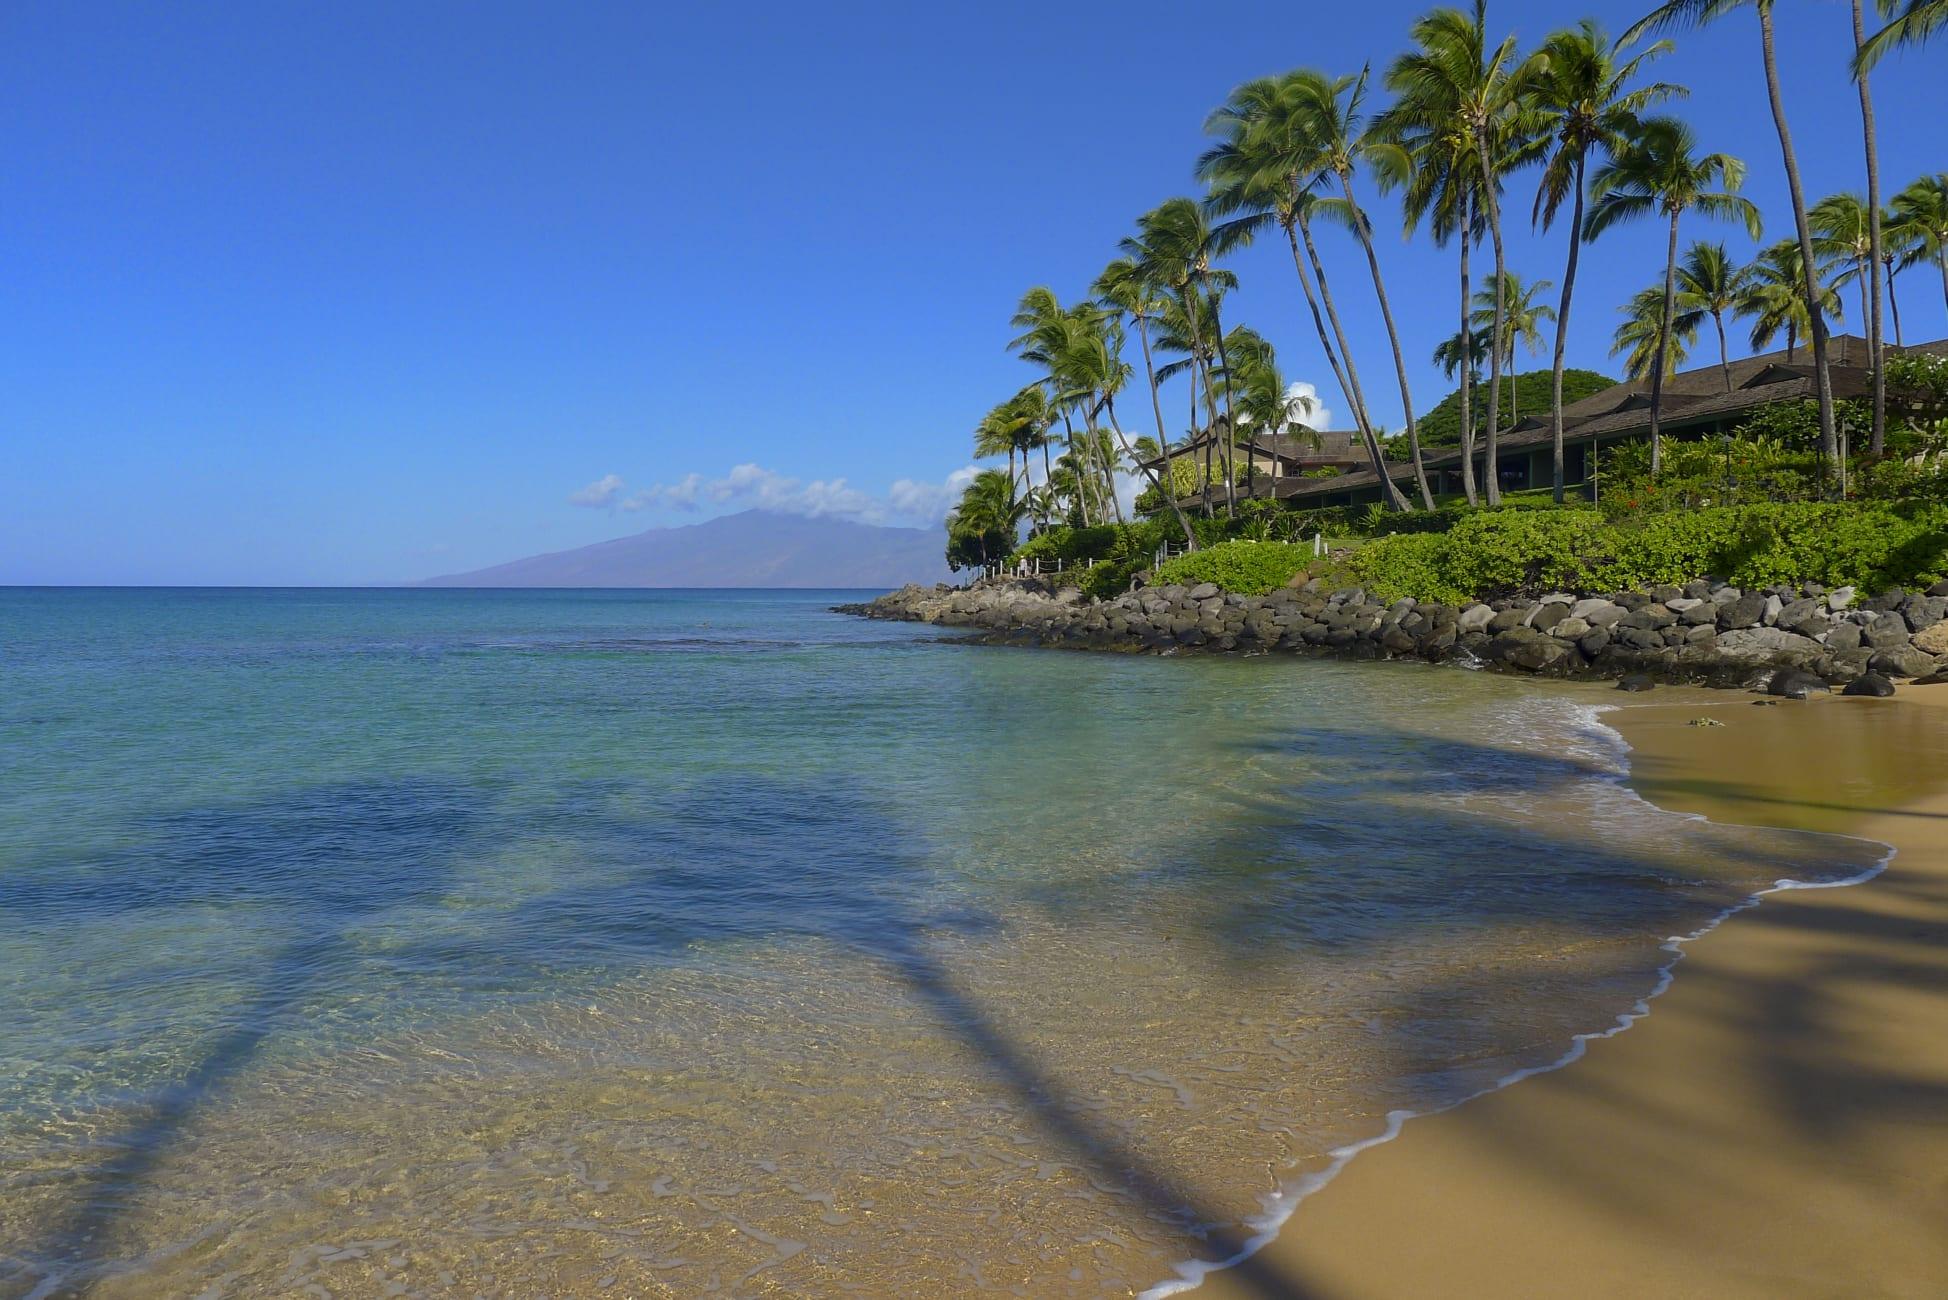 Playa Maui Beach